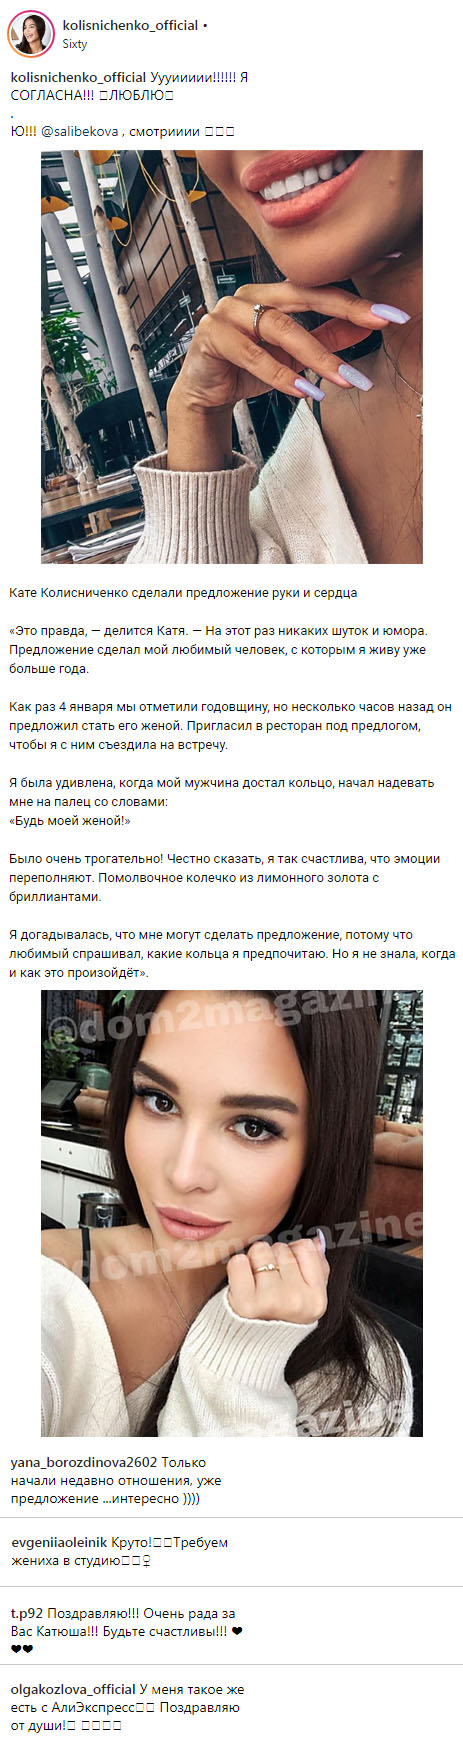 Екатерина Колисниченко получила предложение руки и сердца